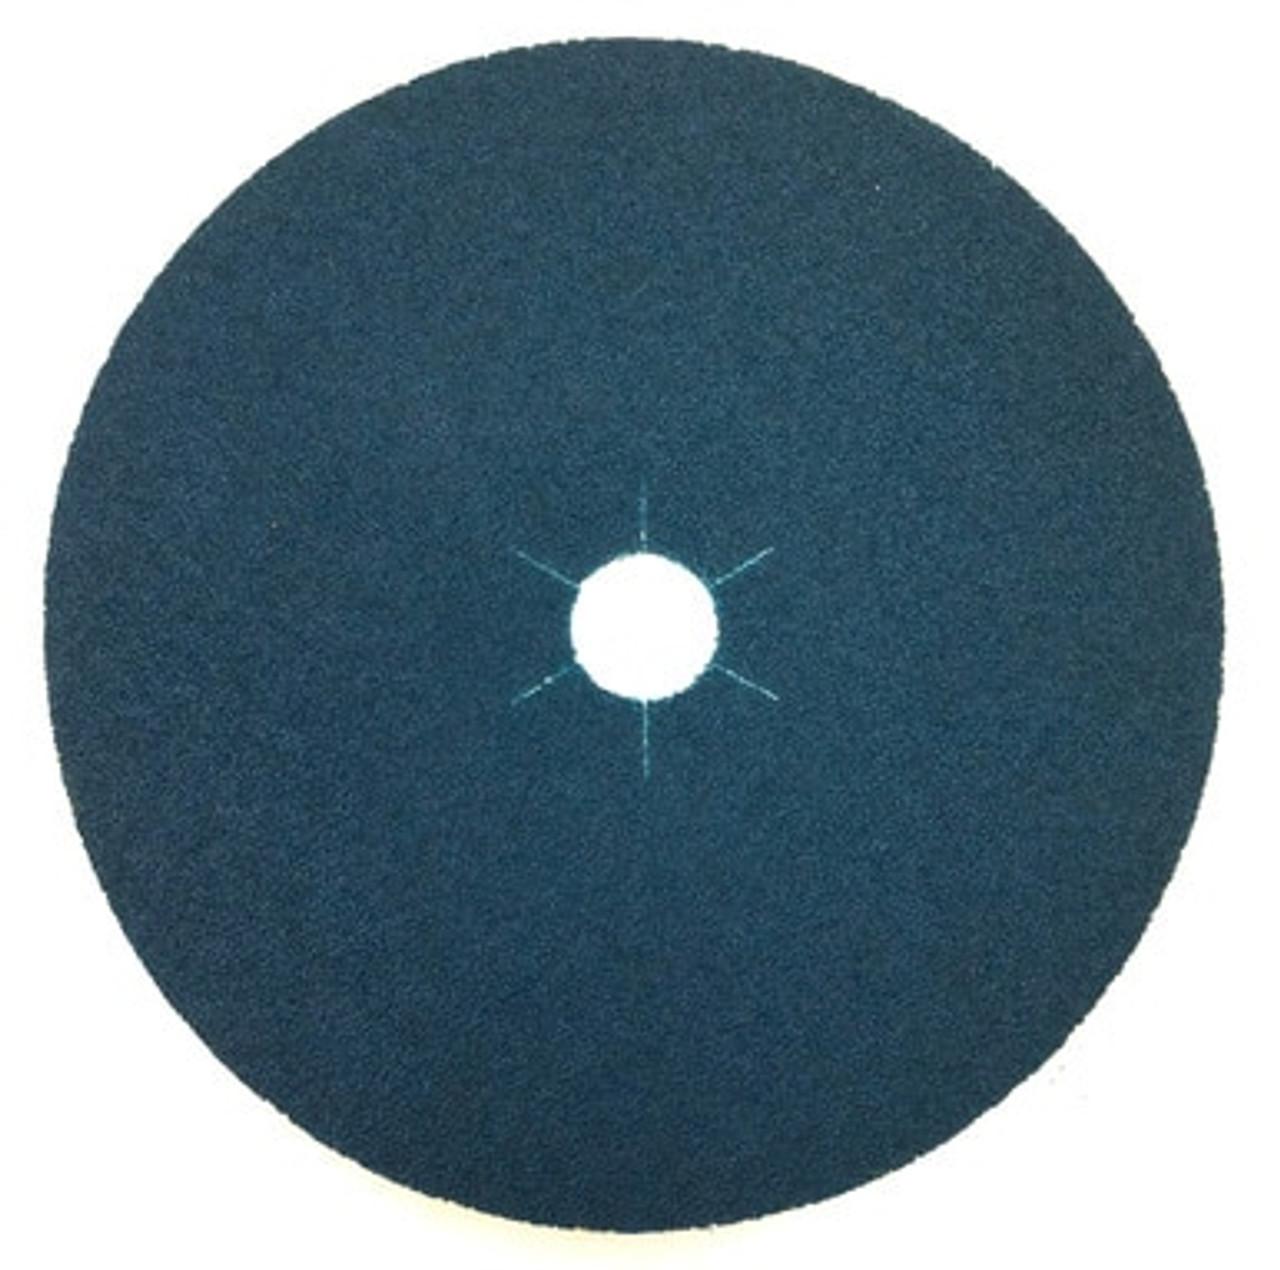 "Bona Blue Anti-Static Edger Disc 6 7/8"" x 7/8"" Hole"